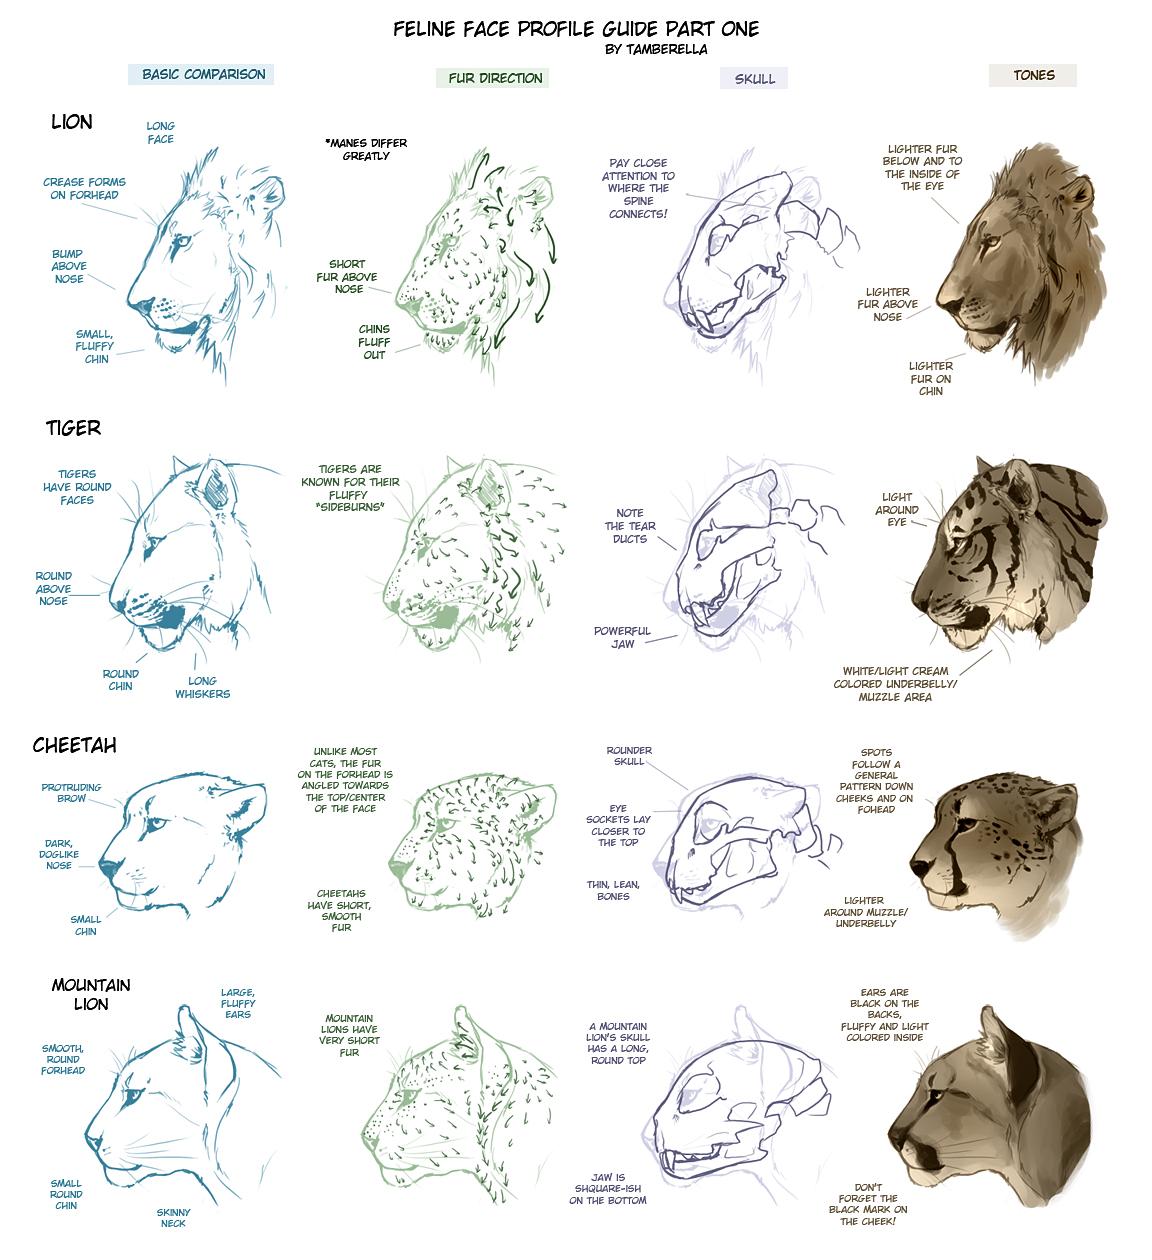 Feline Face Profile Tutorial 1 by TamberElla on DeviantArt